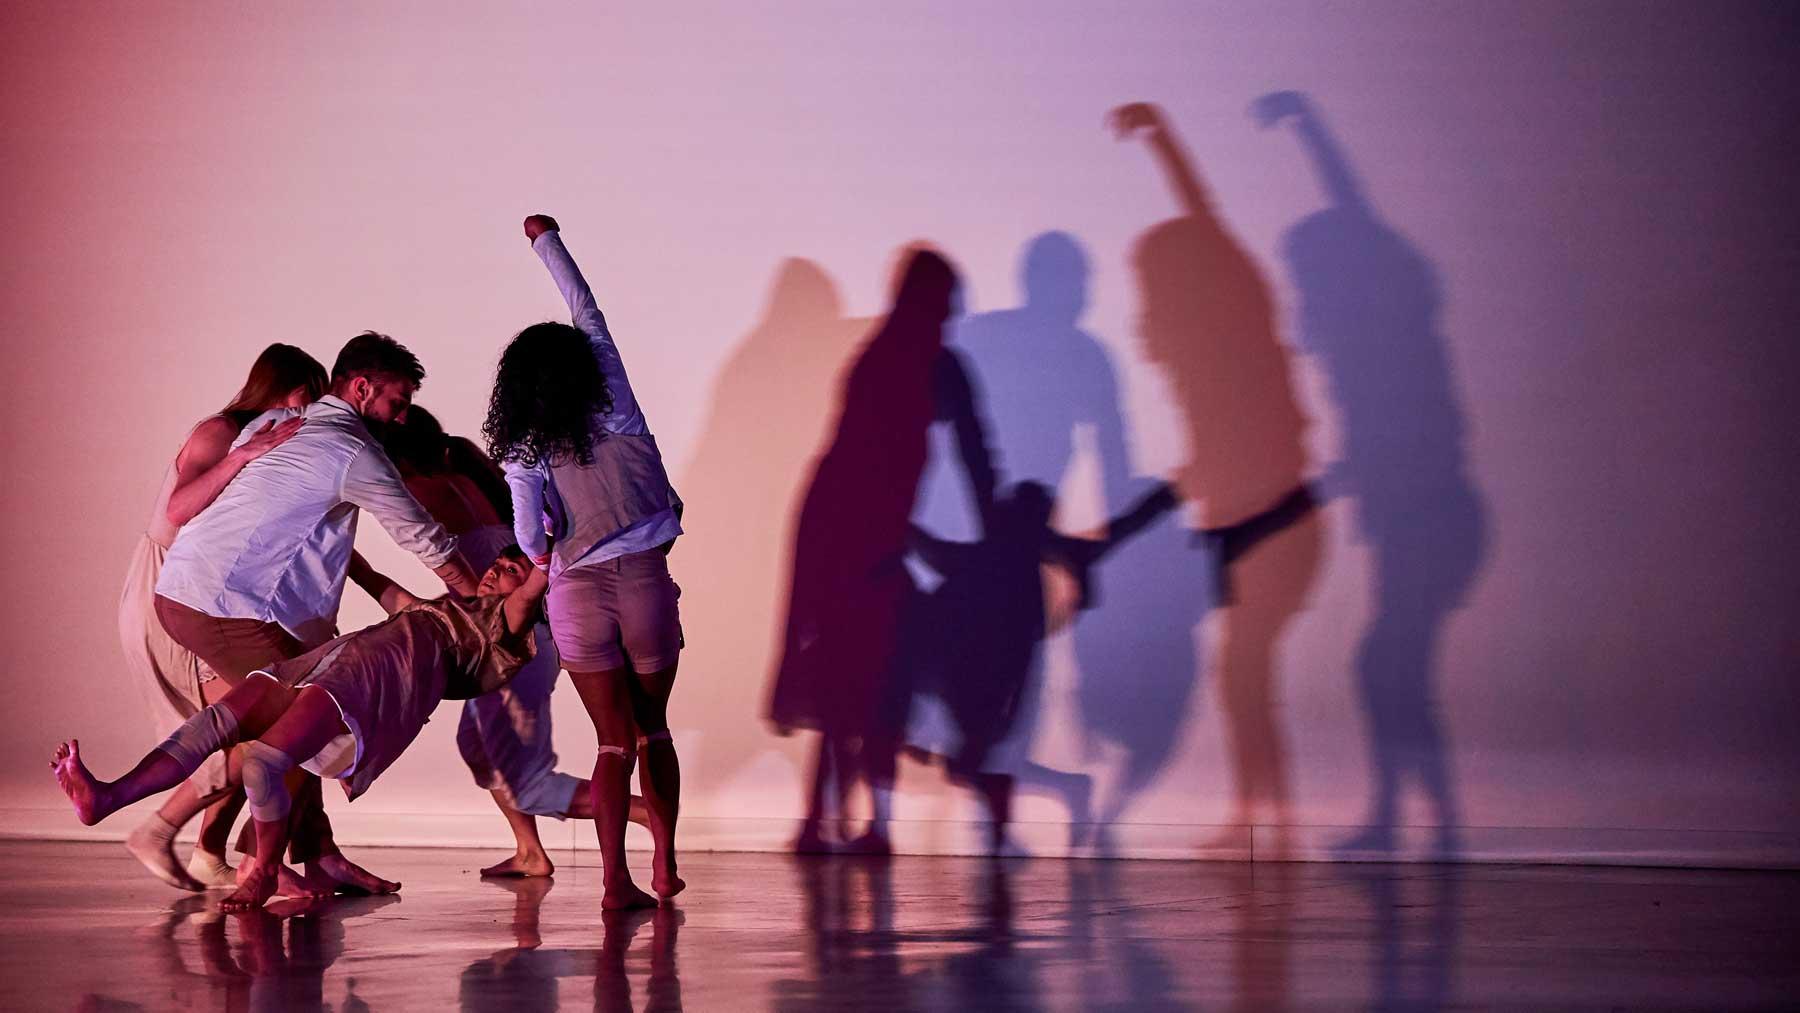 mardi-culturel-td-danse-danse-kyra-jean-green-trip-the-light-fantastic-14.jpg